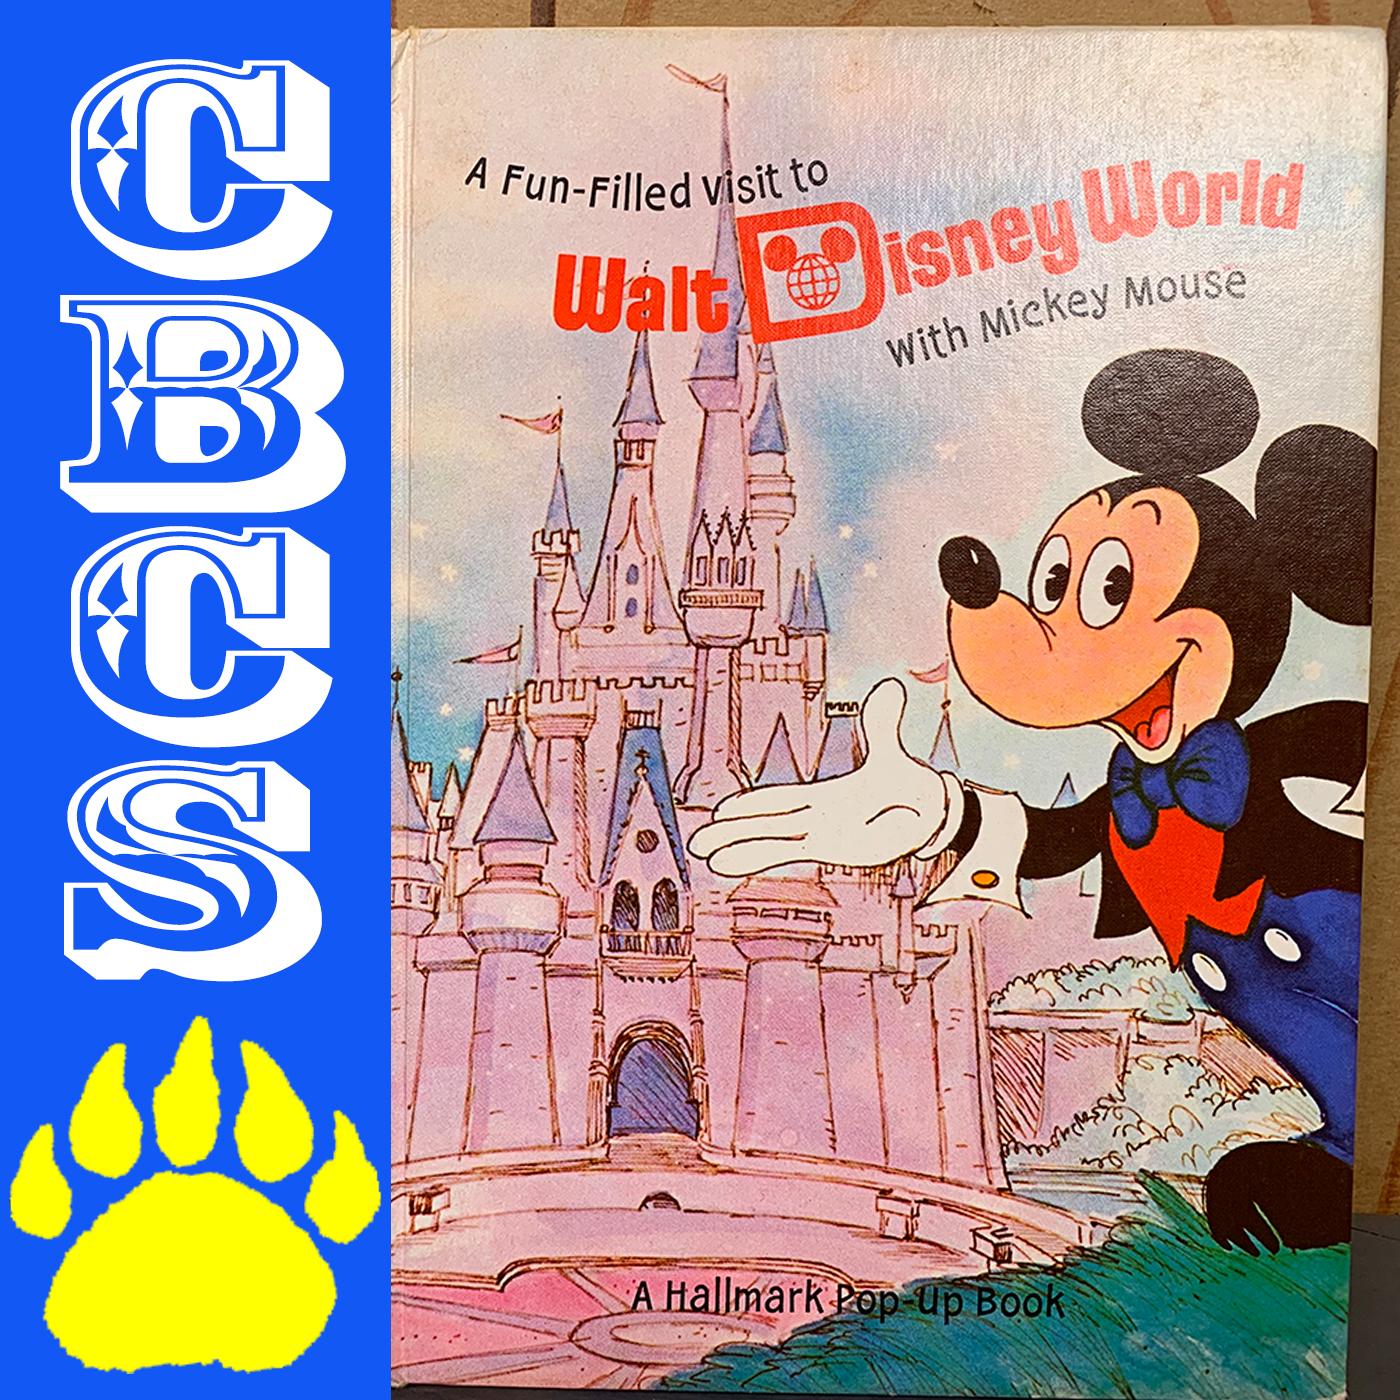 Artwork for 1972 Hallmark Walt Disney World Pop-up Book - Country Bear Collector Show #215